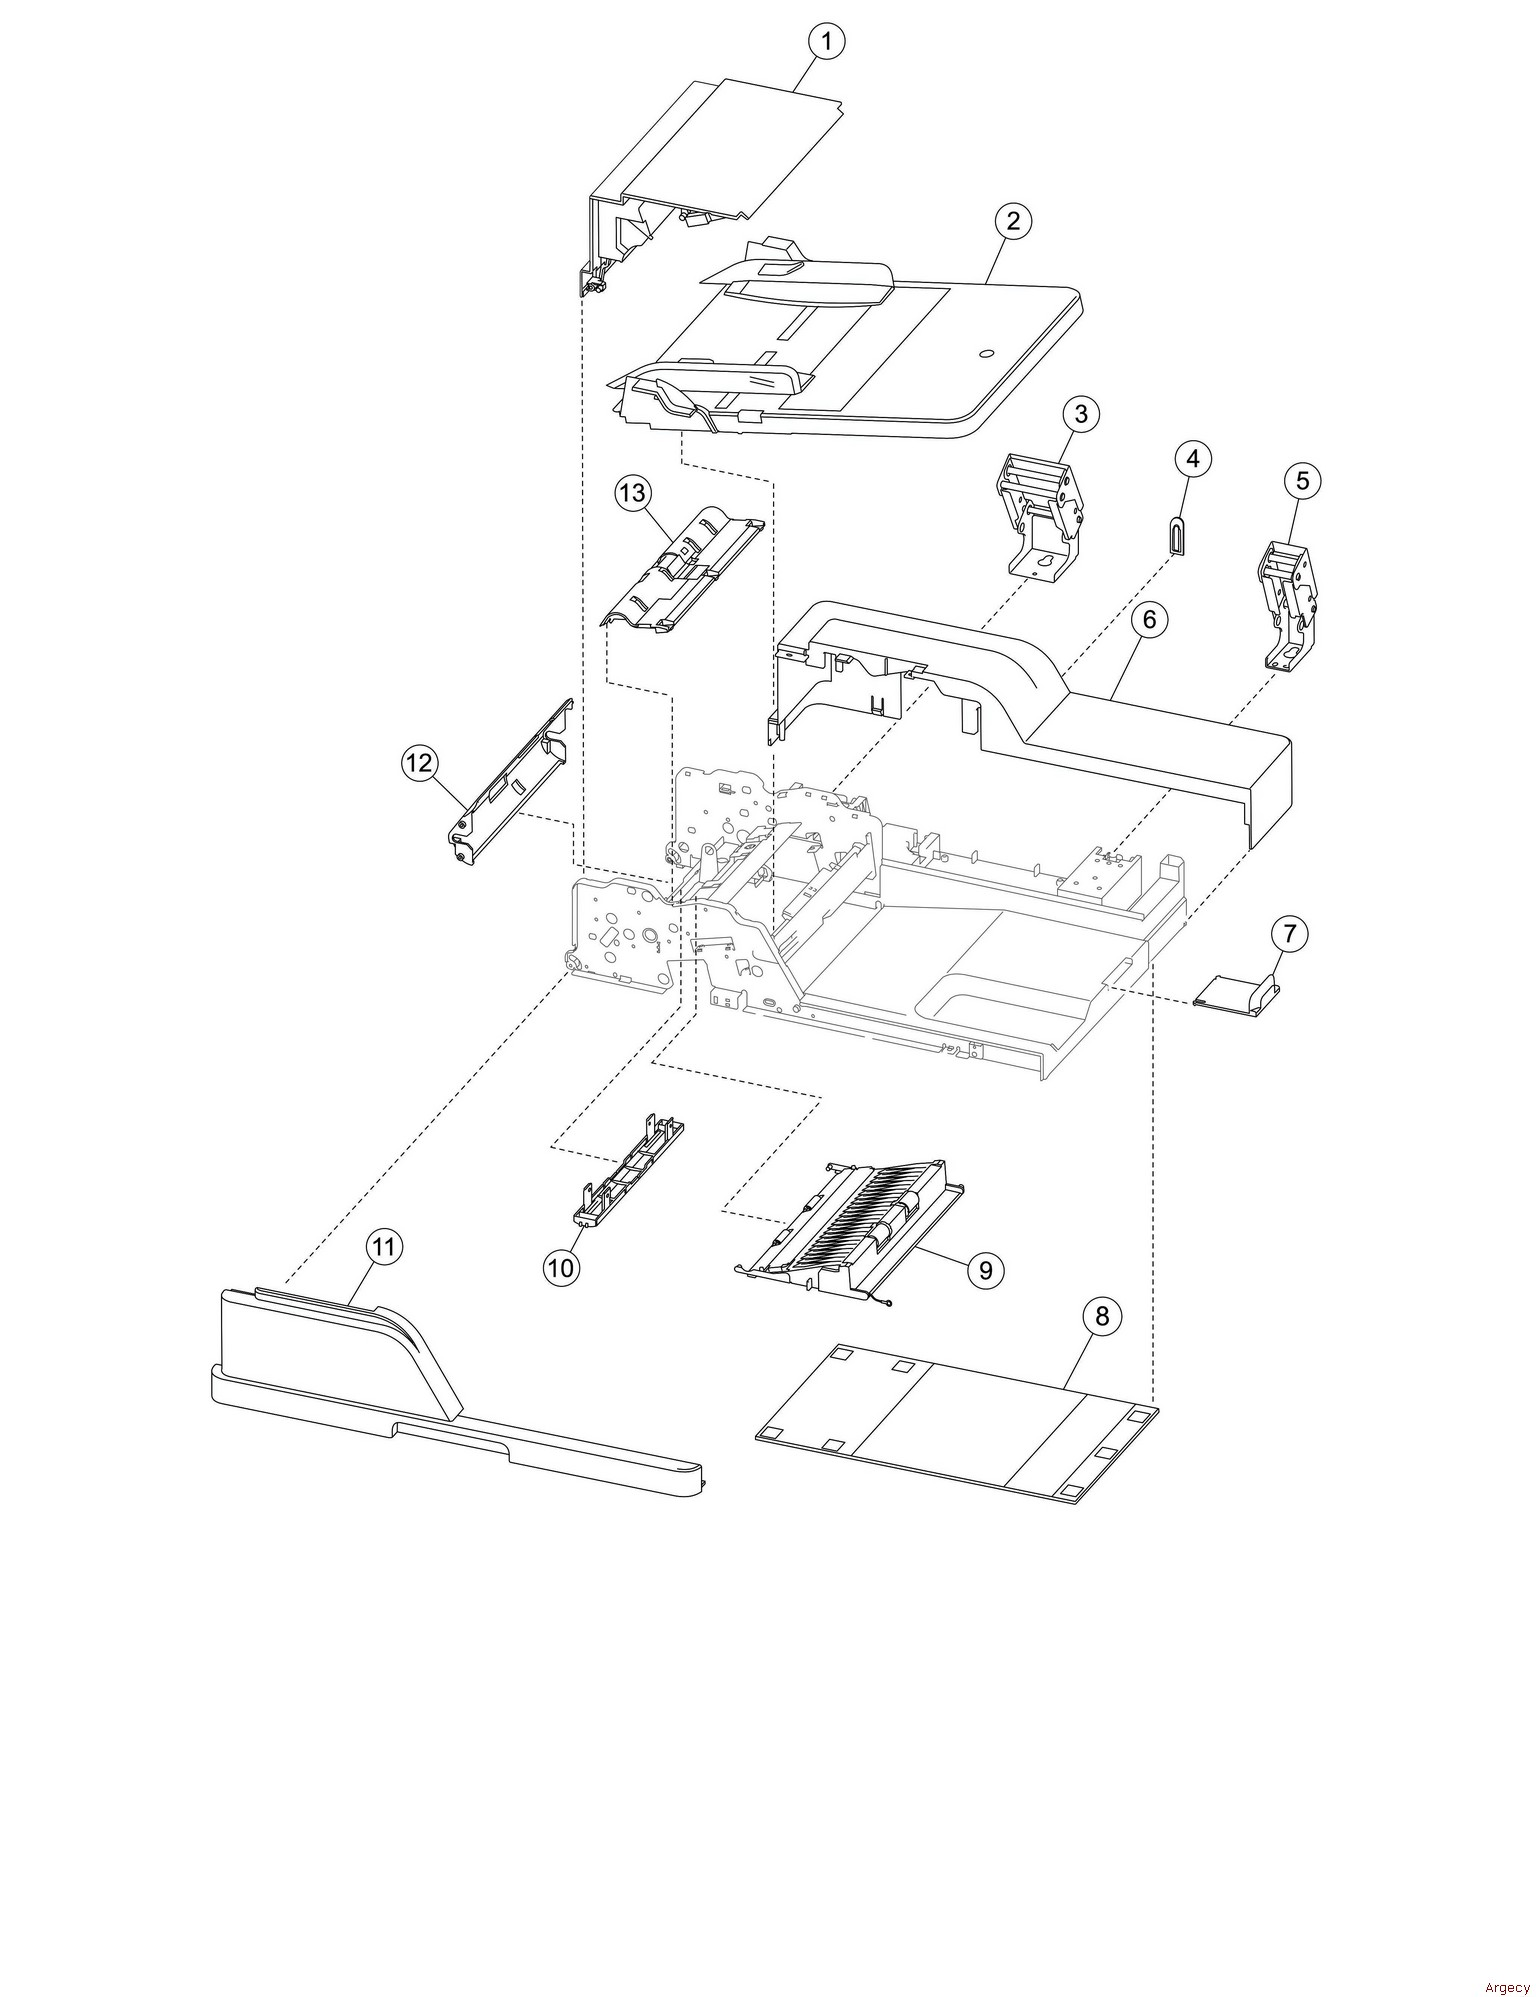 IBM Infoprint 1850 1860 1870 1880 MFP Parts (4548, 4566